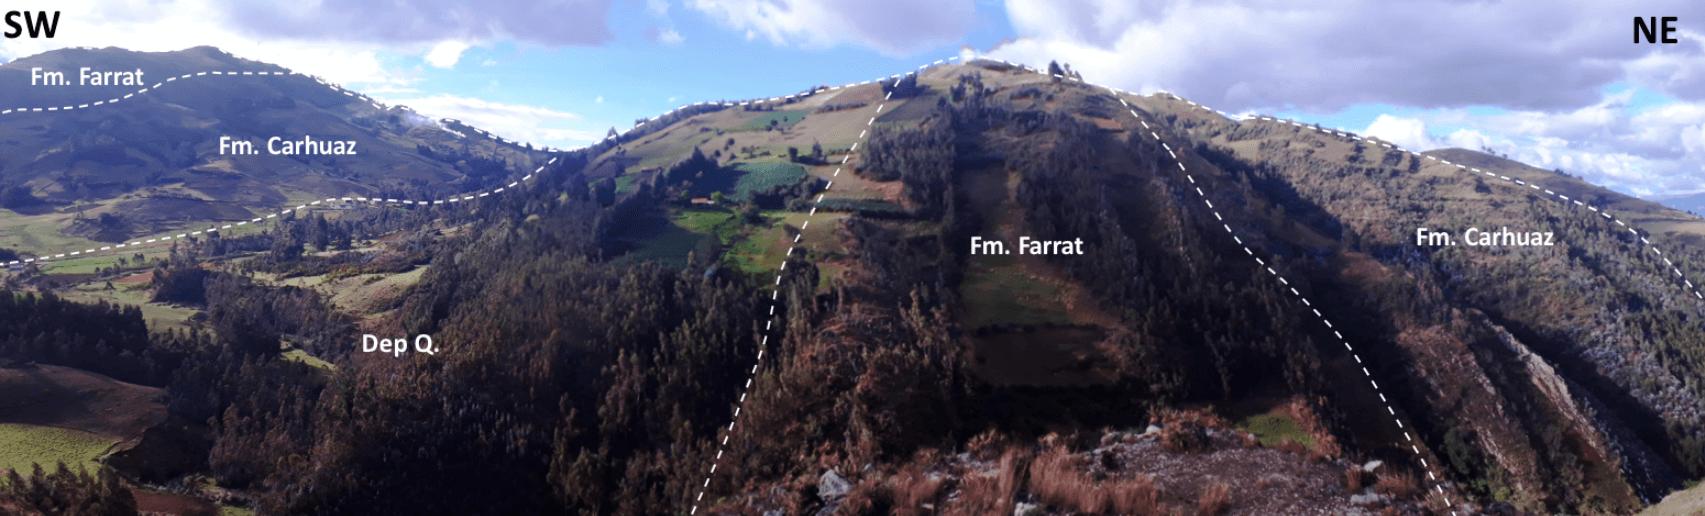 cerro colorado 4 mina